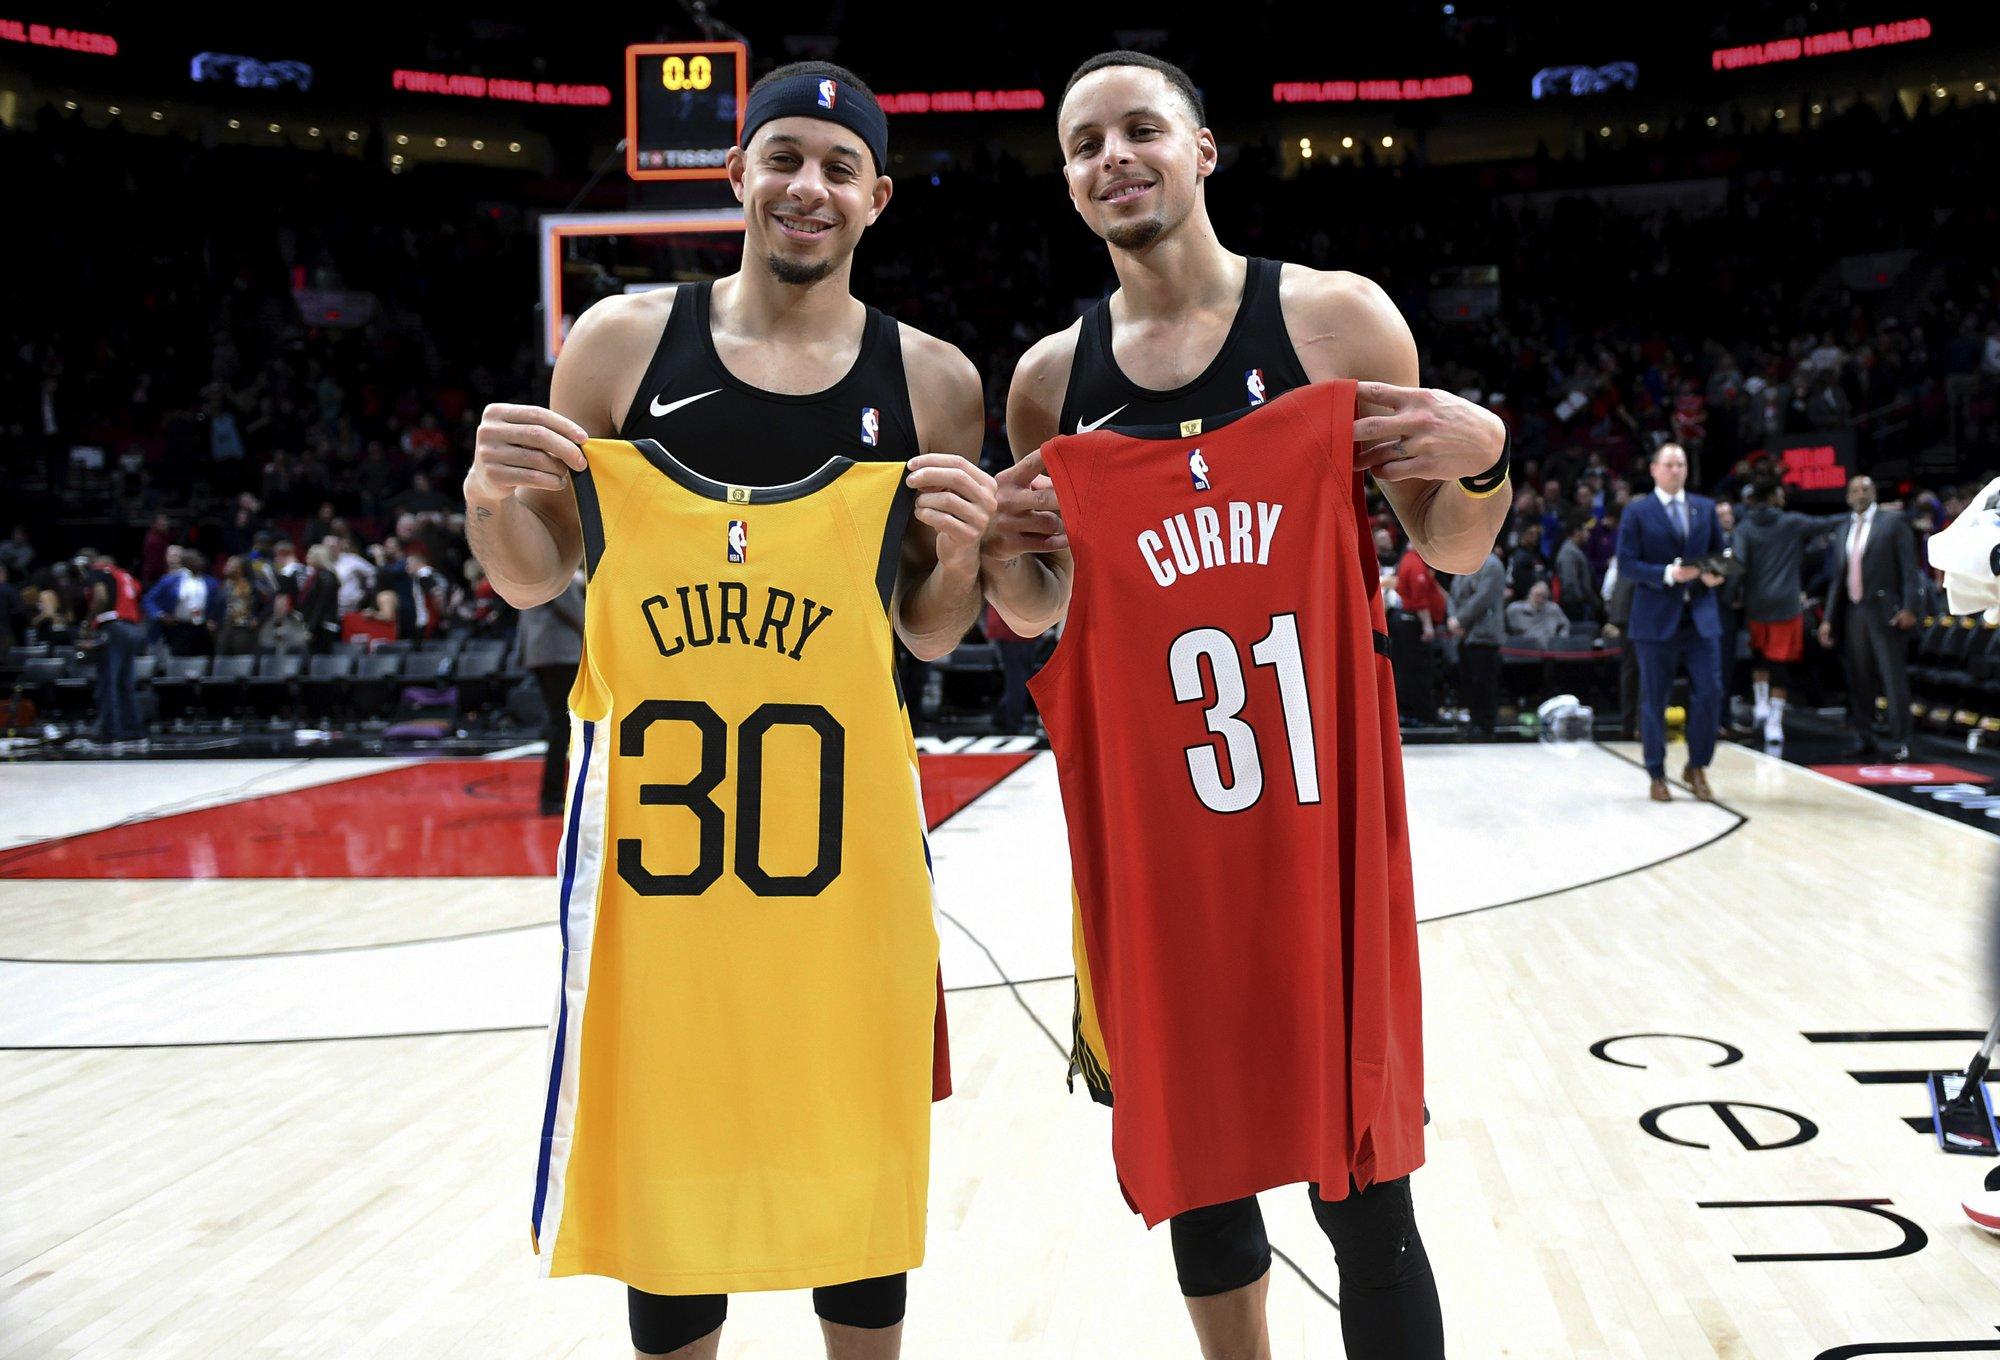 NBA, FIBA bringing pro league to Africa